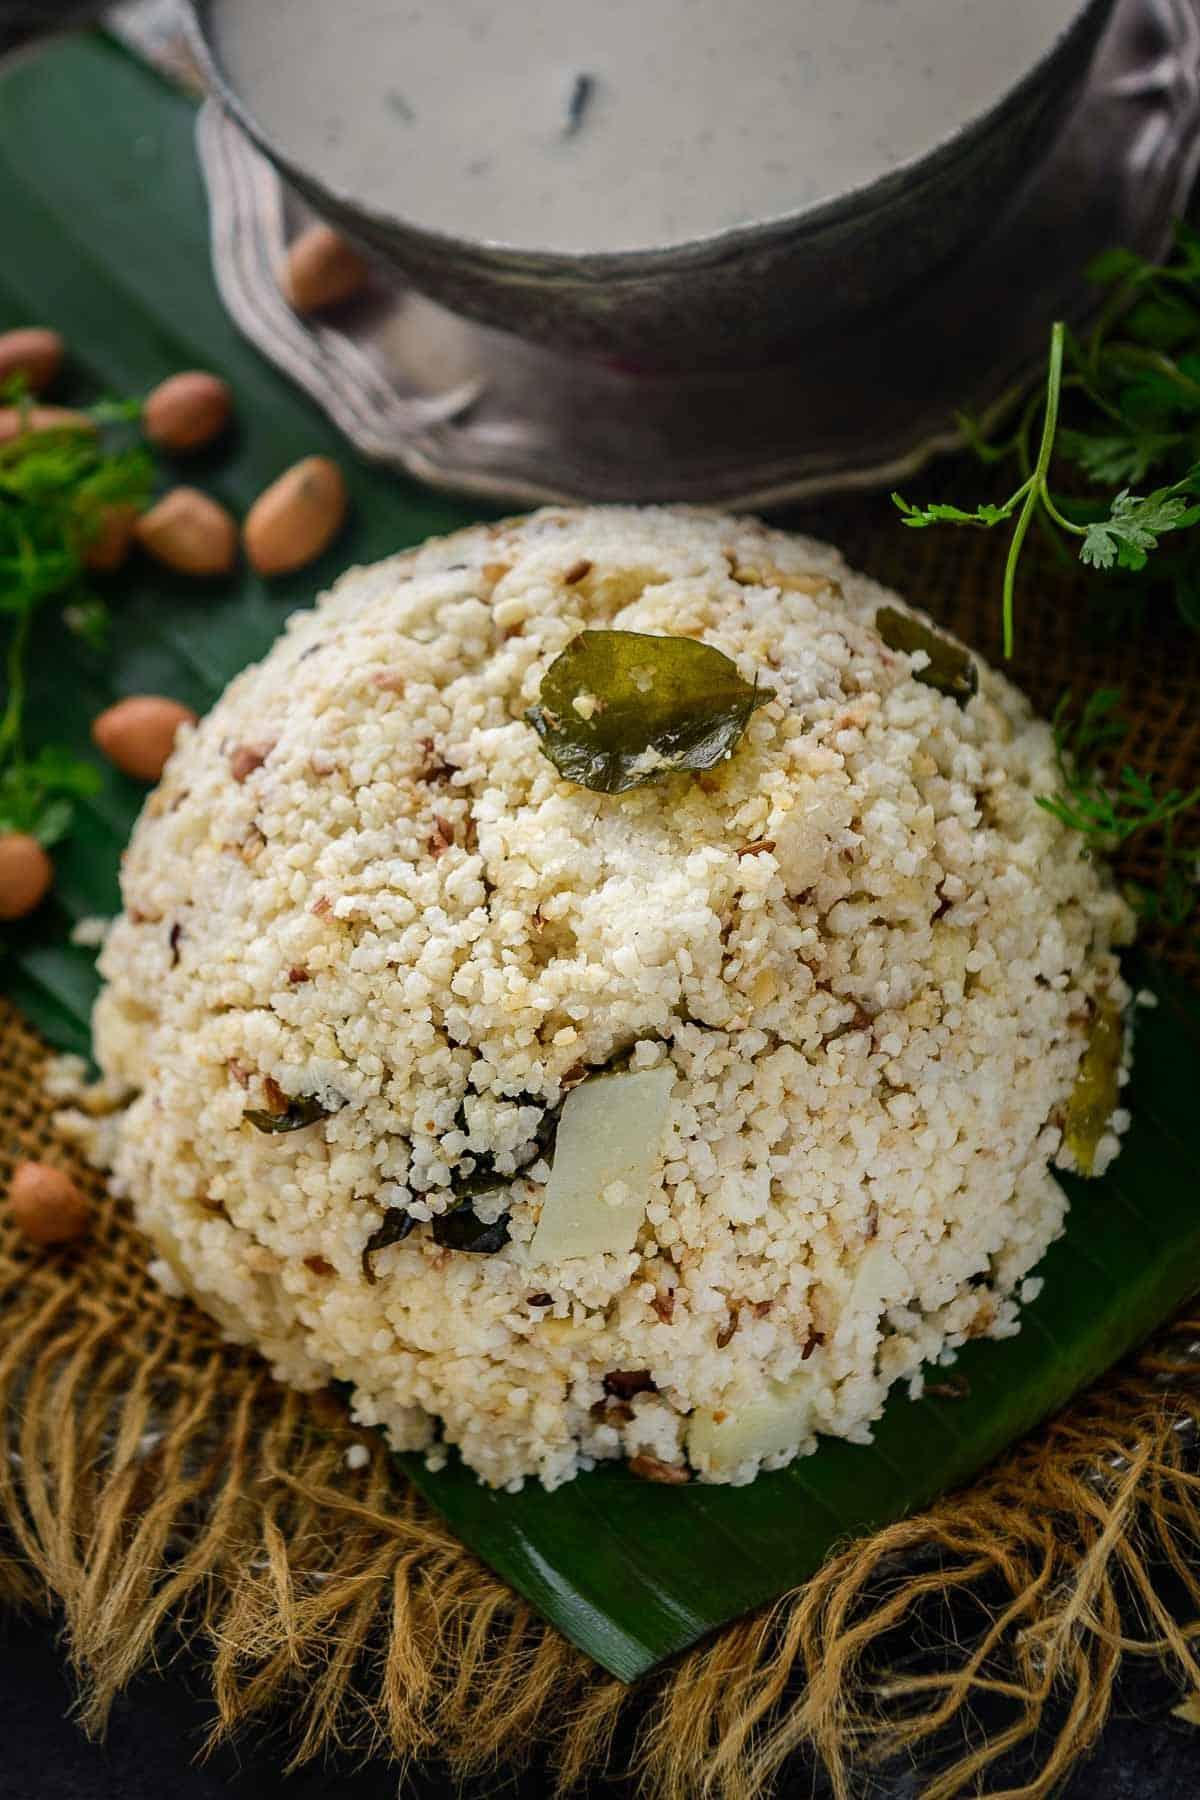 Bhagar khichdi served on a plate.